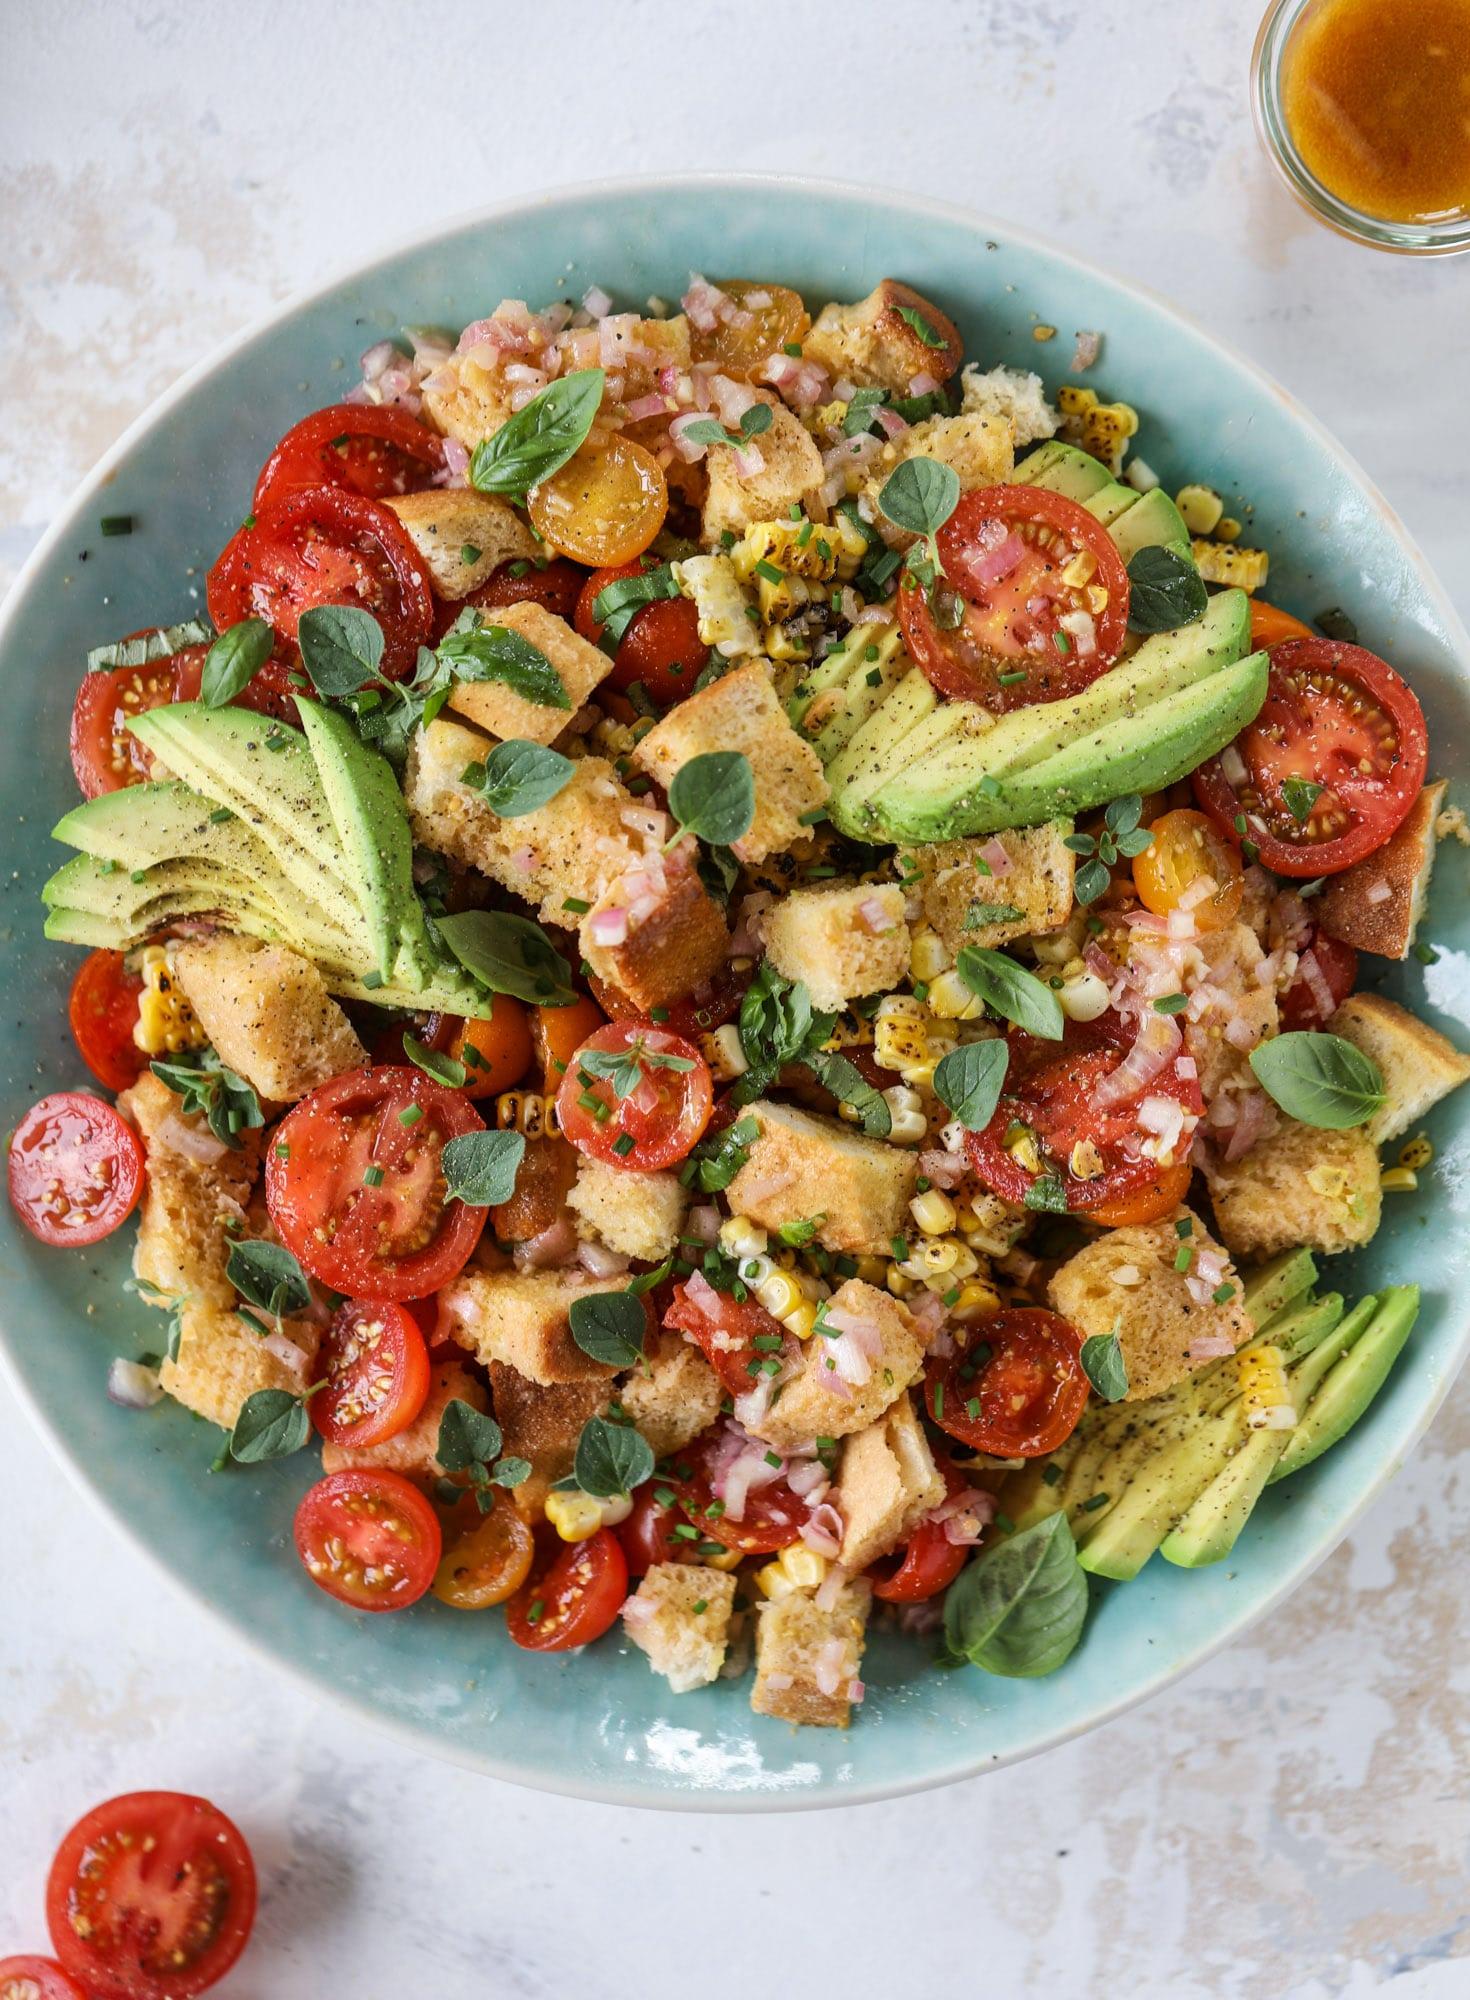 17+ The Best Summer Panzanella Salad Image